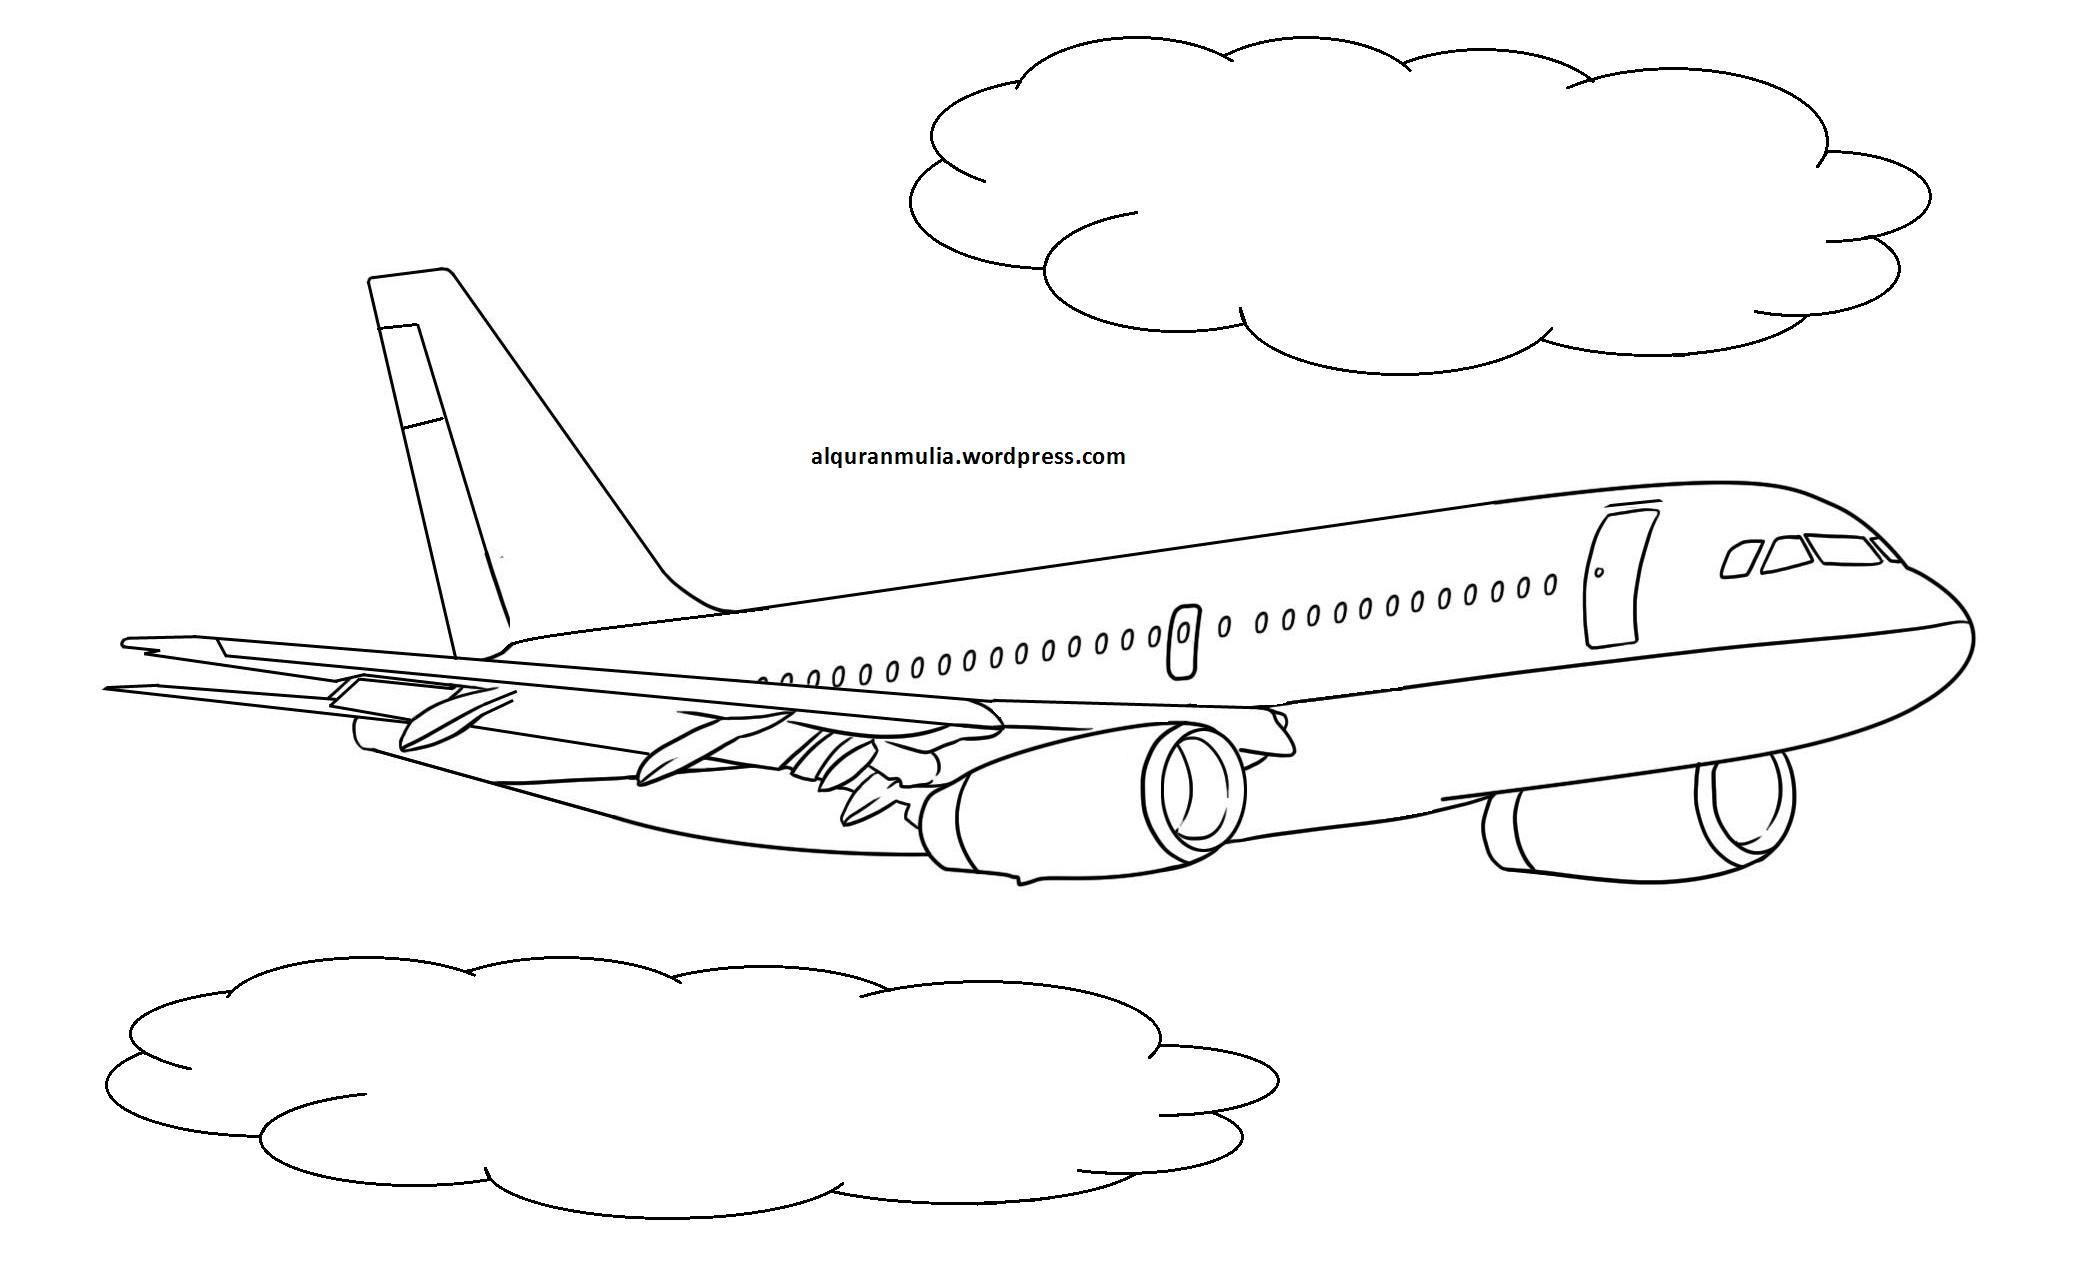 Gambar Mewarnai Pesawat Terbang